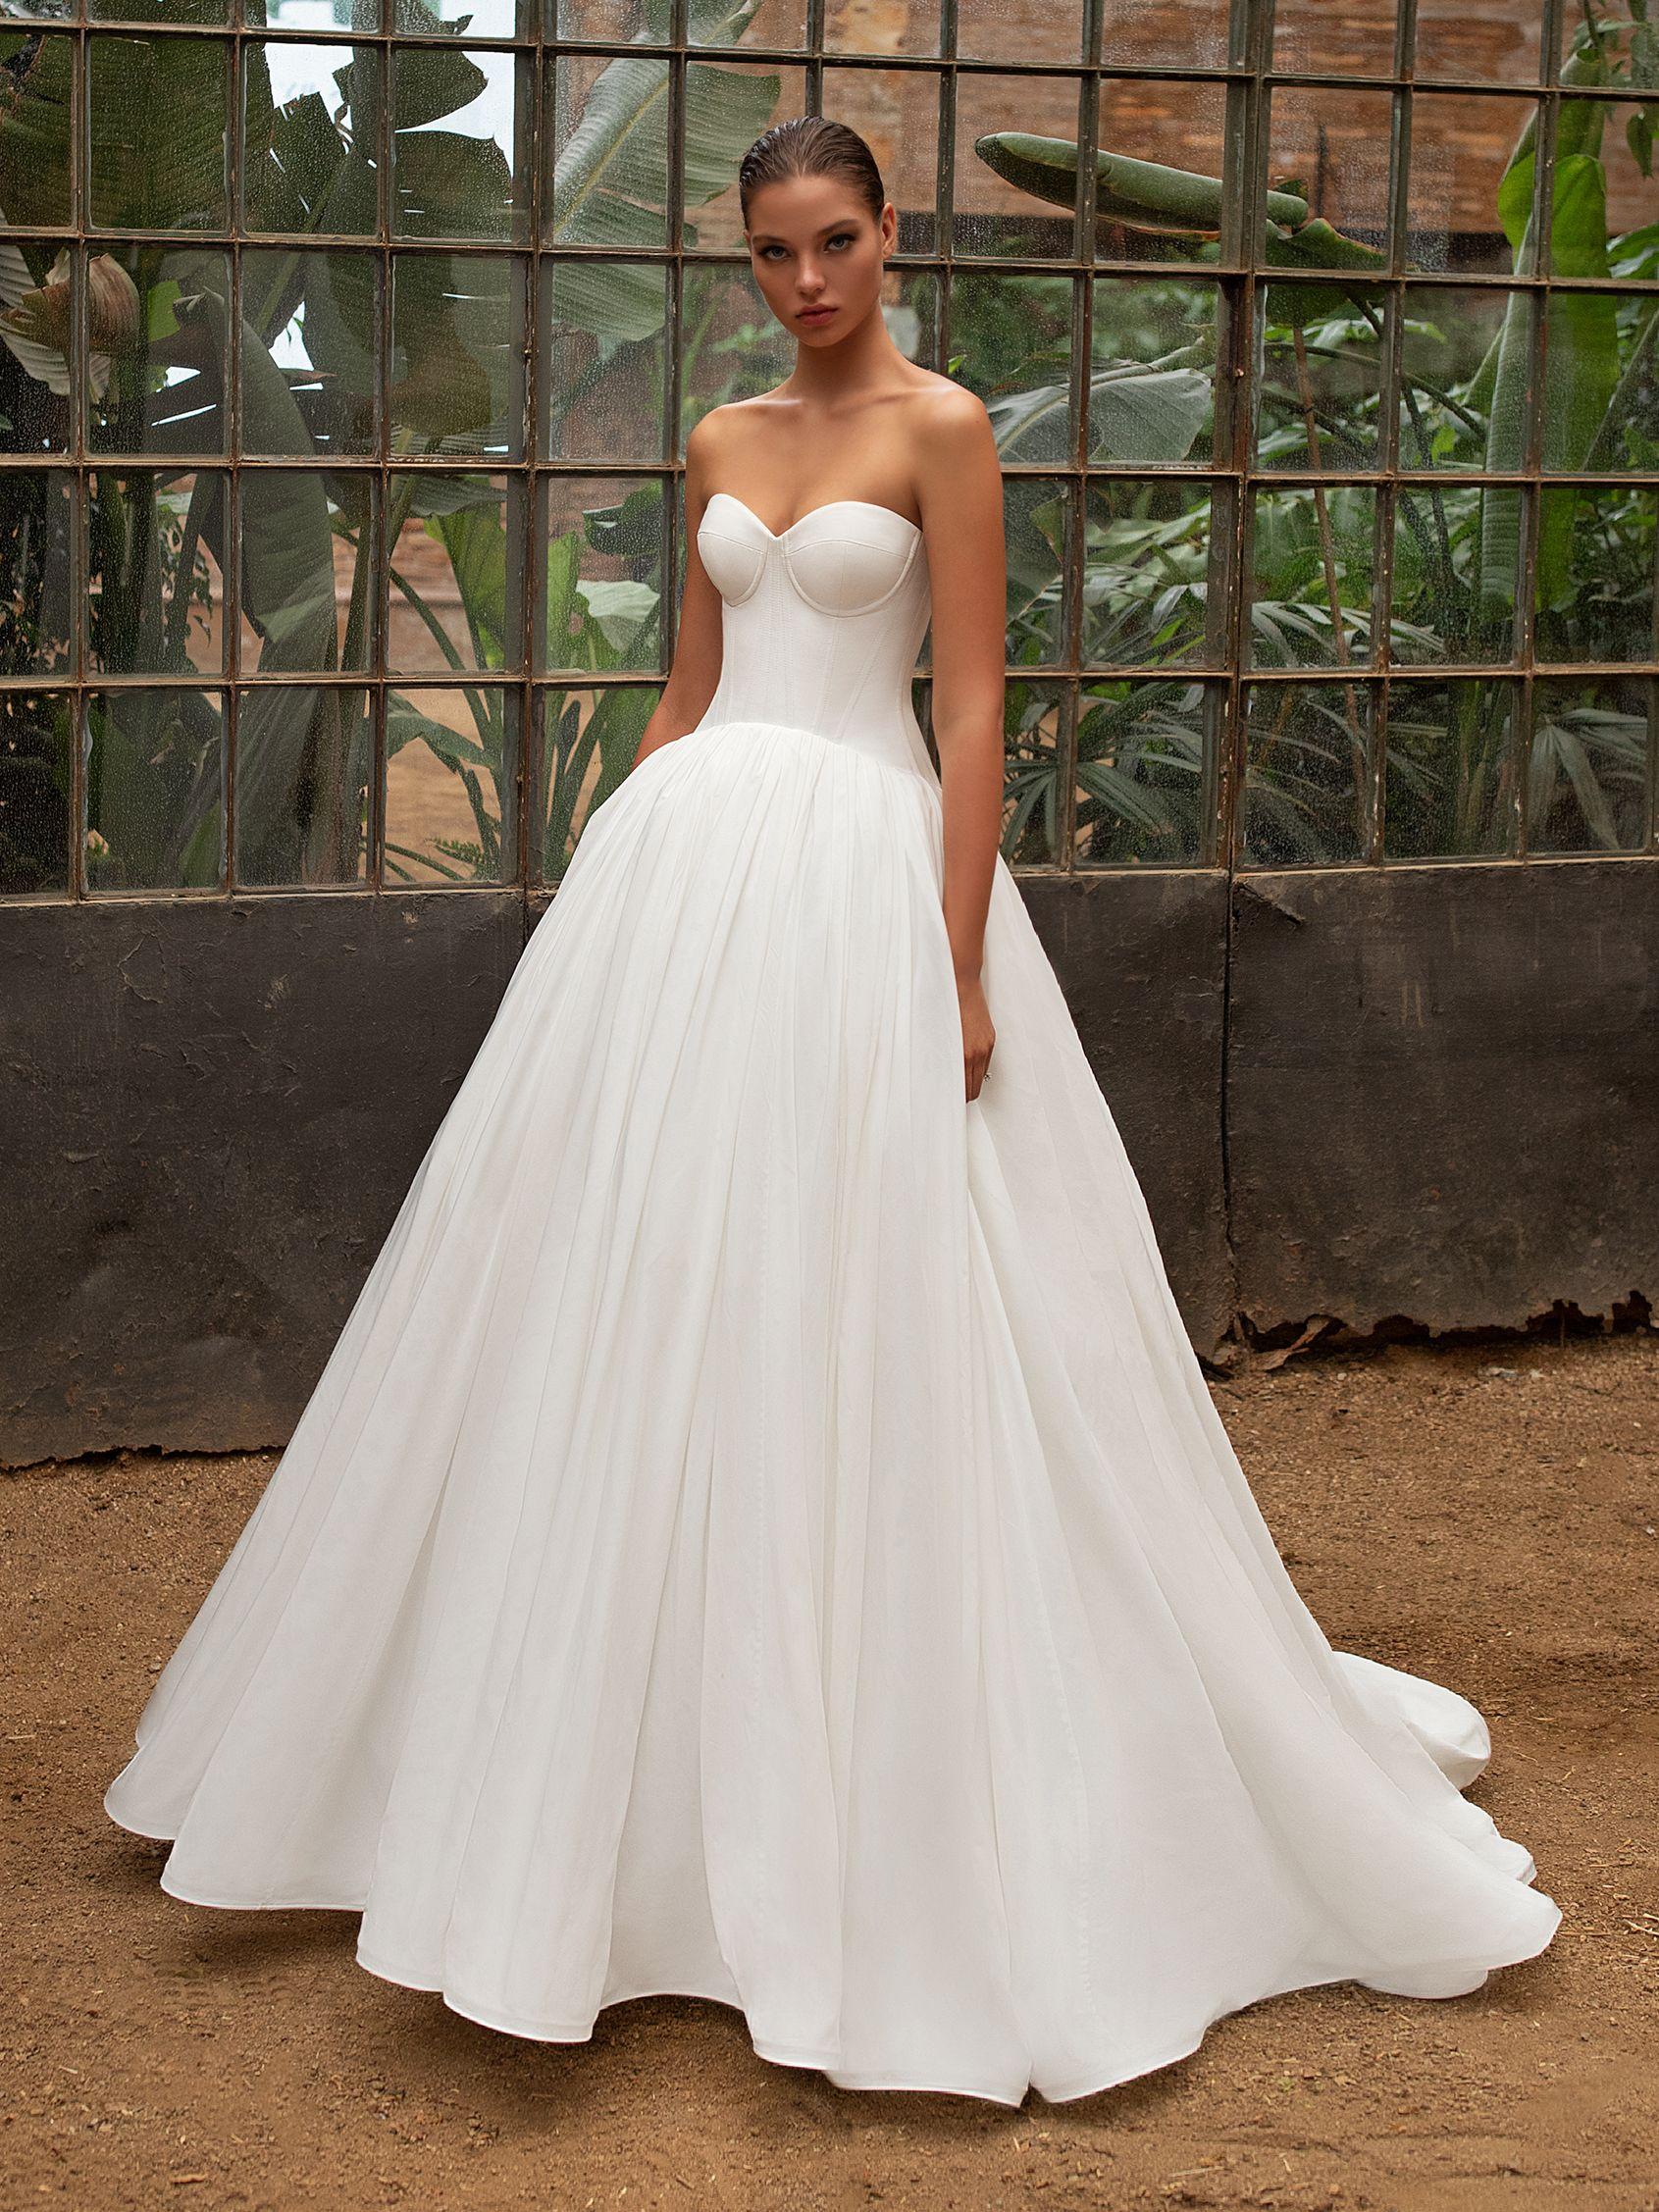 Coco Dress In 2020 Womens Wedding Dresses Zac Posen Wedding Dress Wedding Dresses